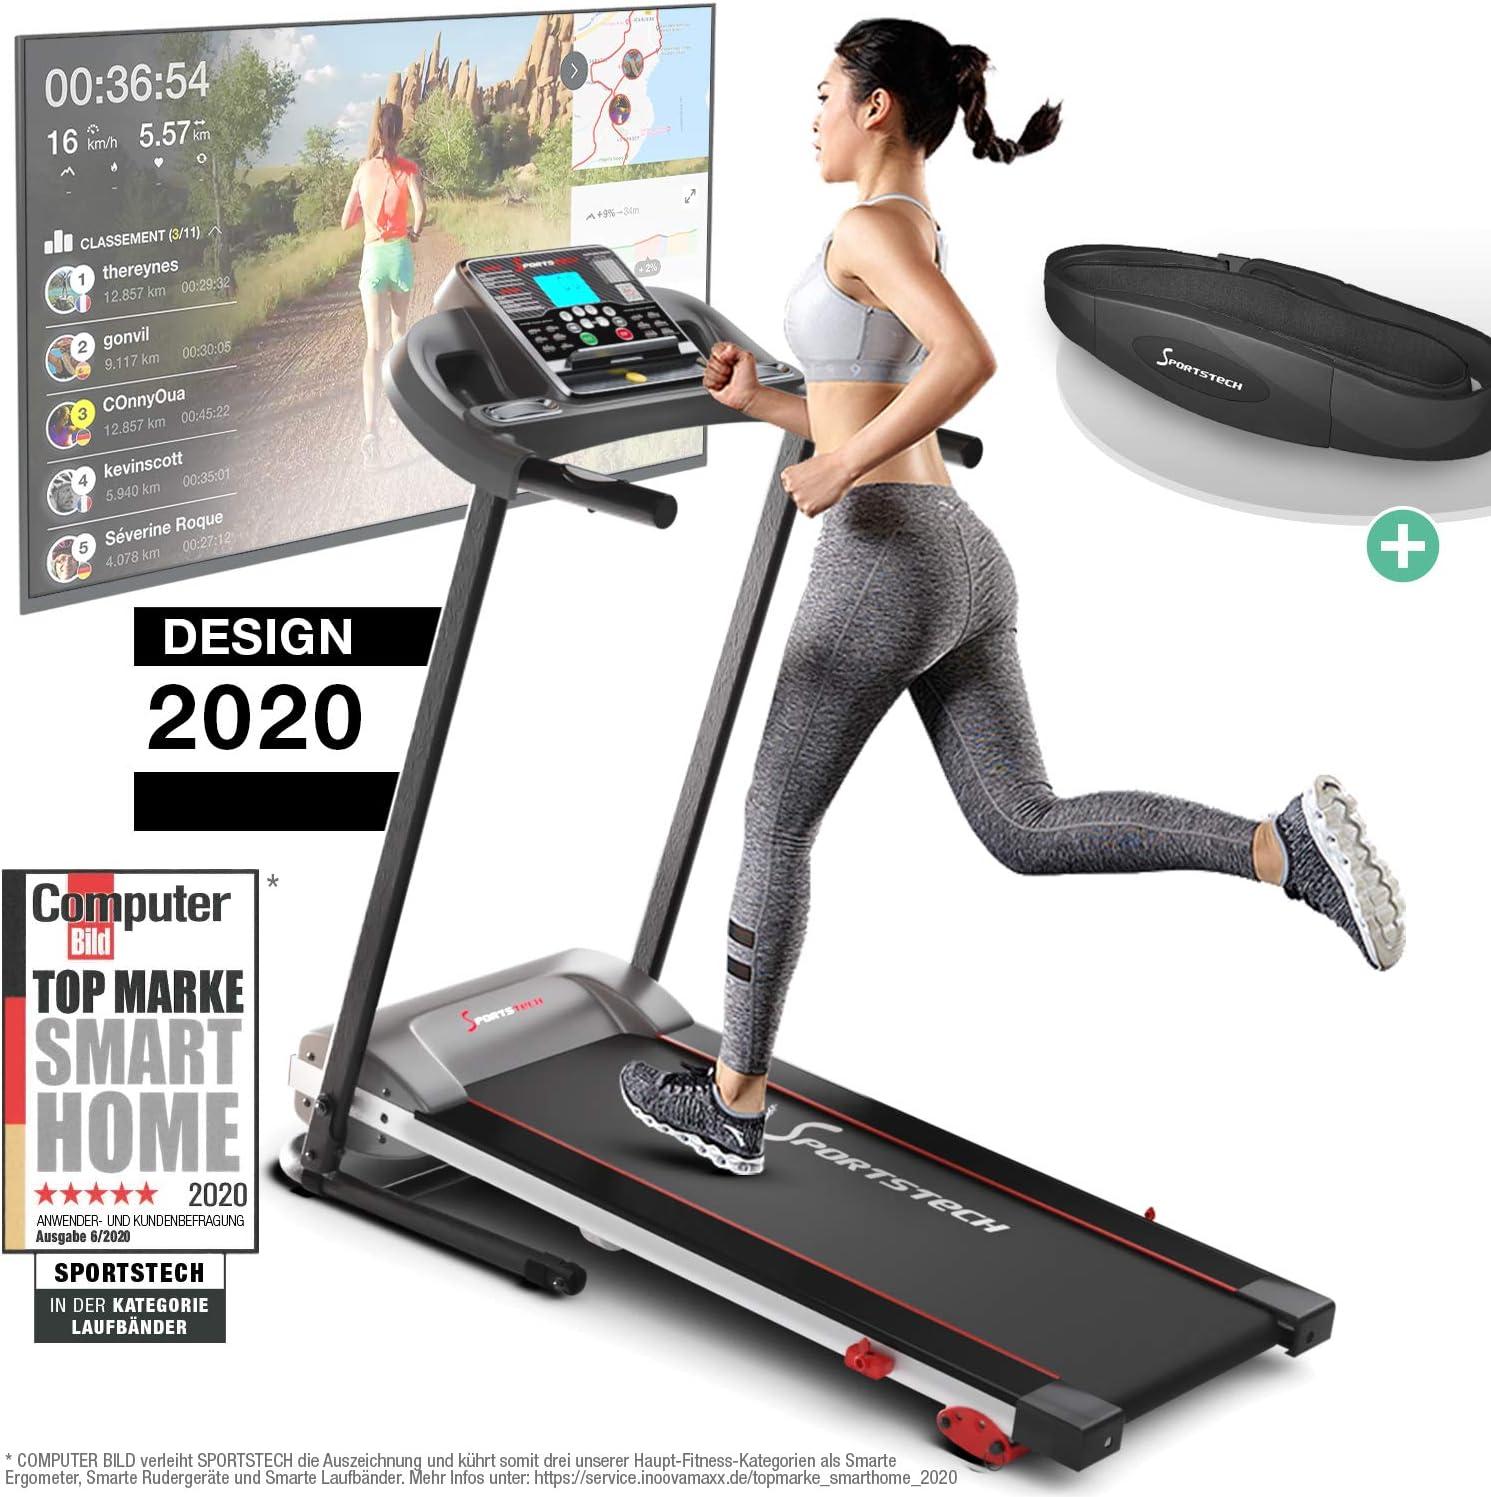 Sportstech F10 Cinta de Correr Modelo 2020 - Marca de Calidad ...